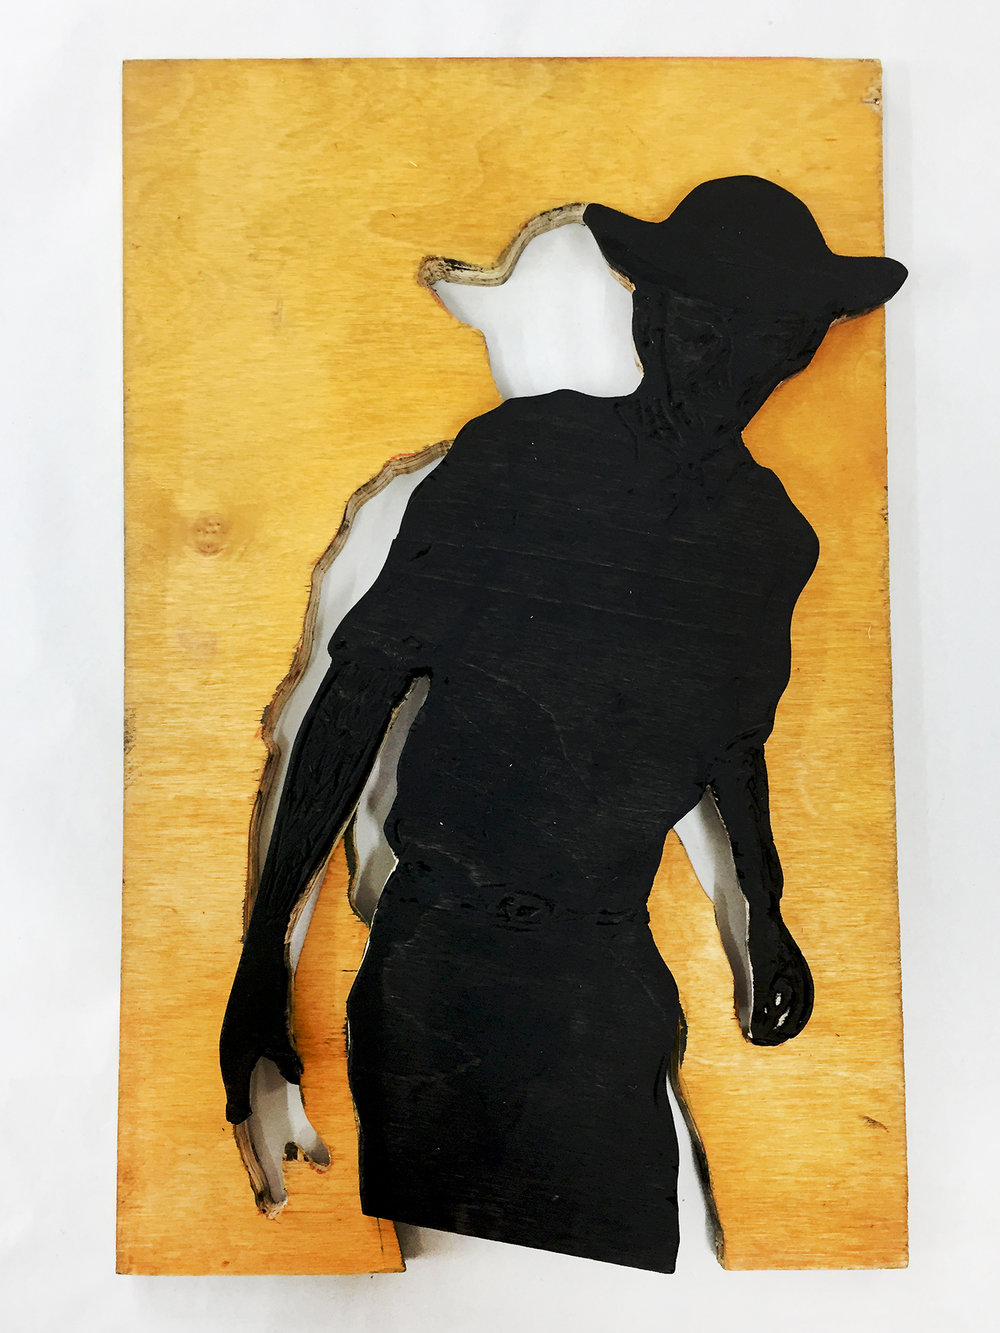 Proces, træplader til Knud Oddes nye serie | Foto: Niels Borch Jensen Gallery and Editions.